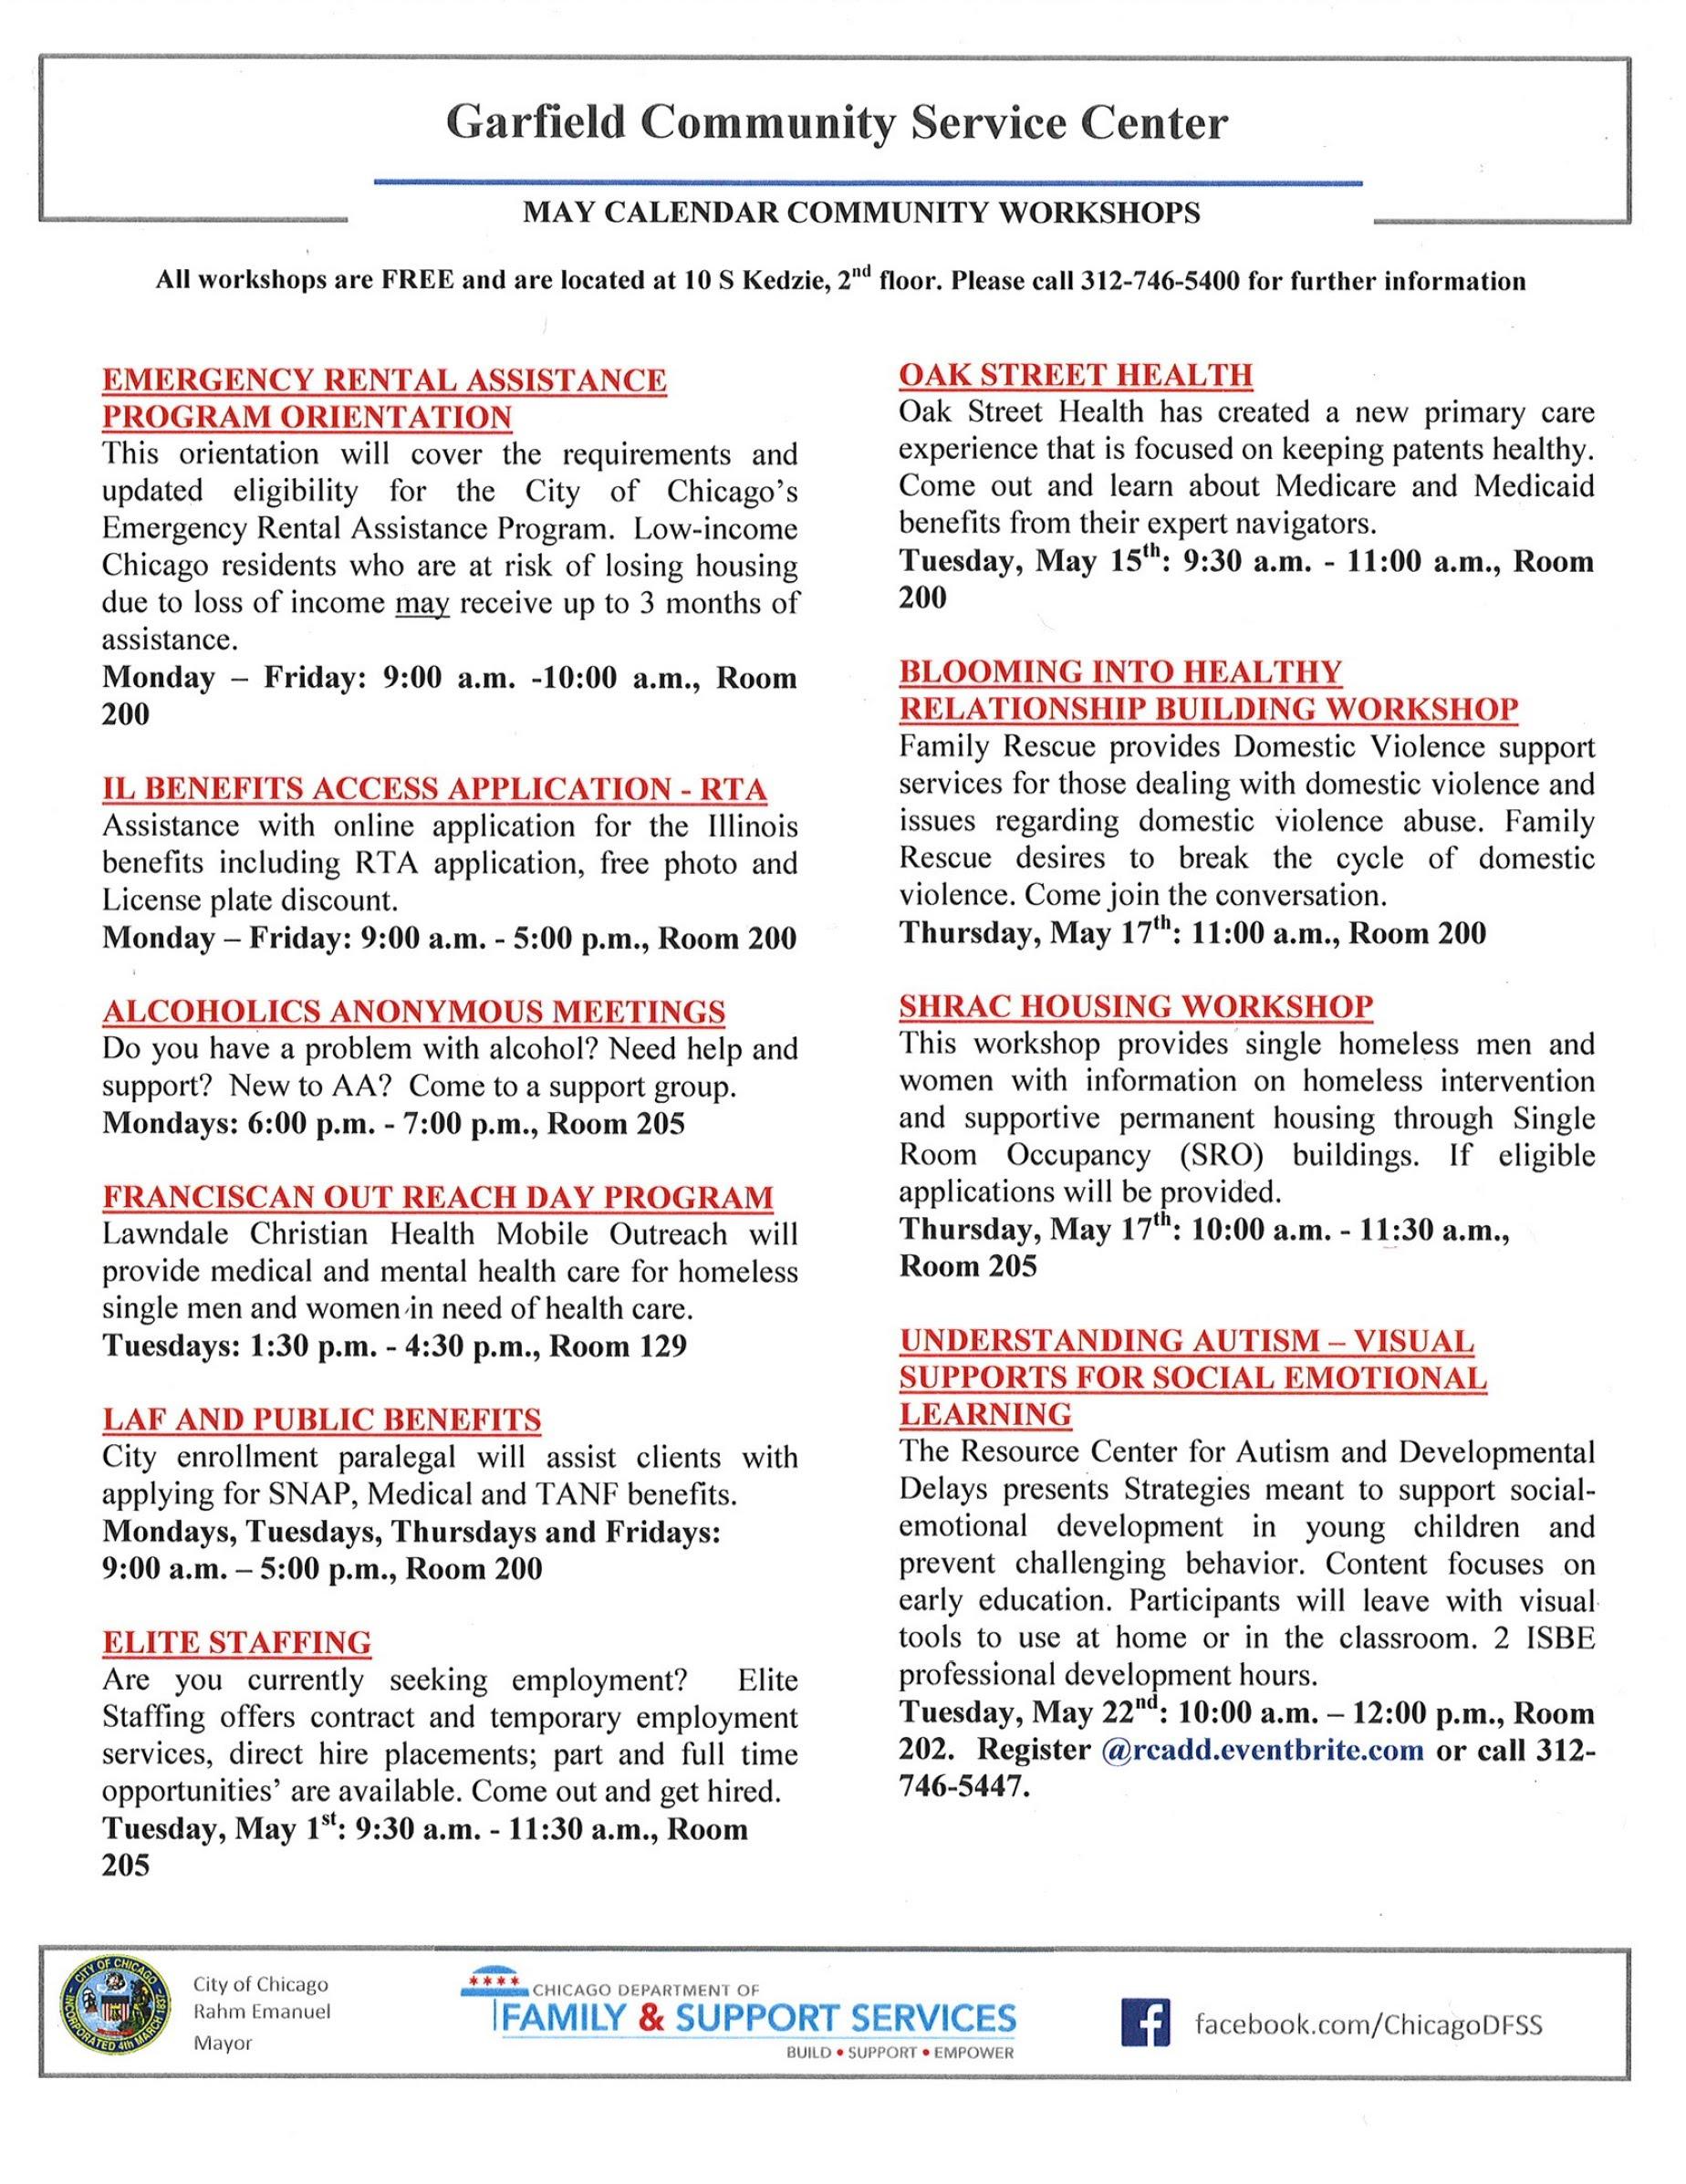 Garfield Community Service Center - May Calendar Community Workshops